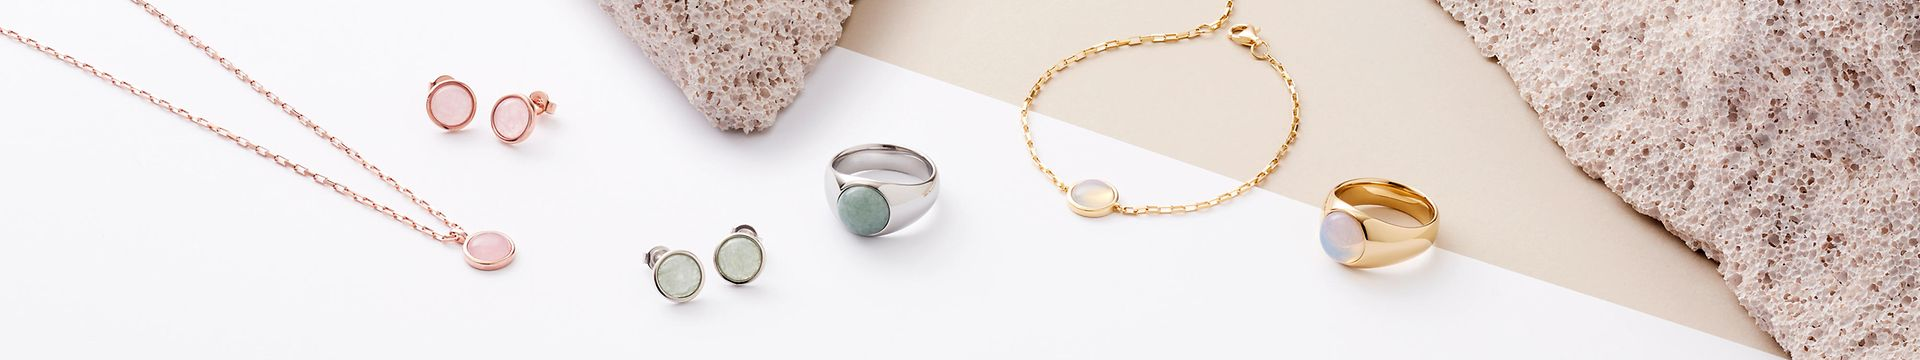 152021 - Women - Accessories - Fashion jewellery - Jewelry - TC banner -IMG